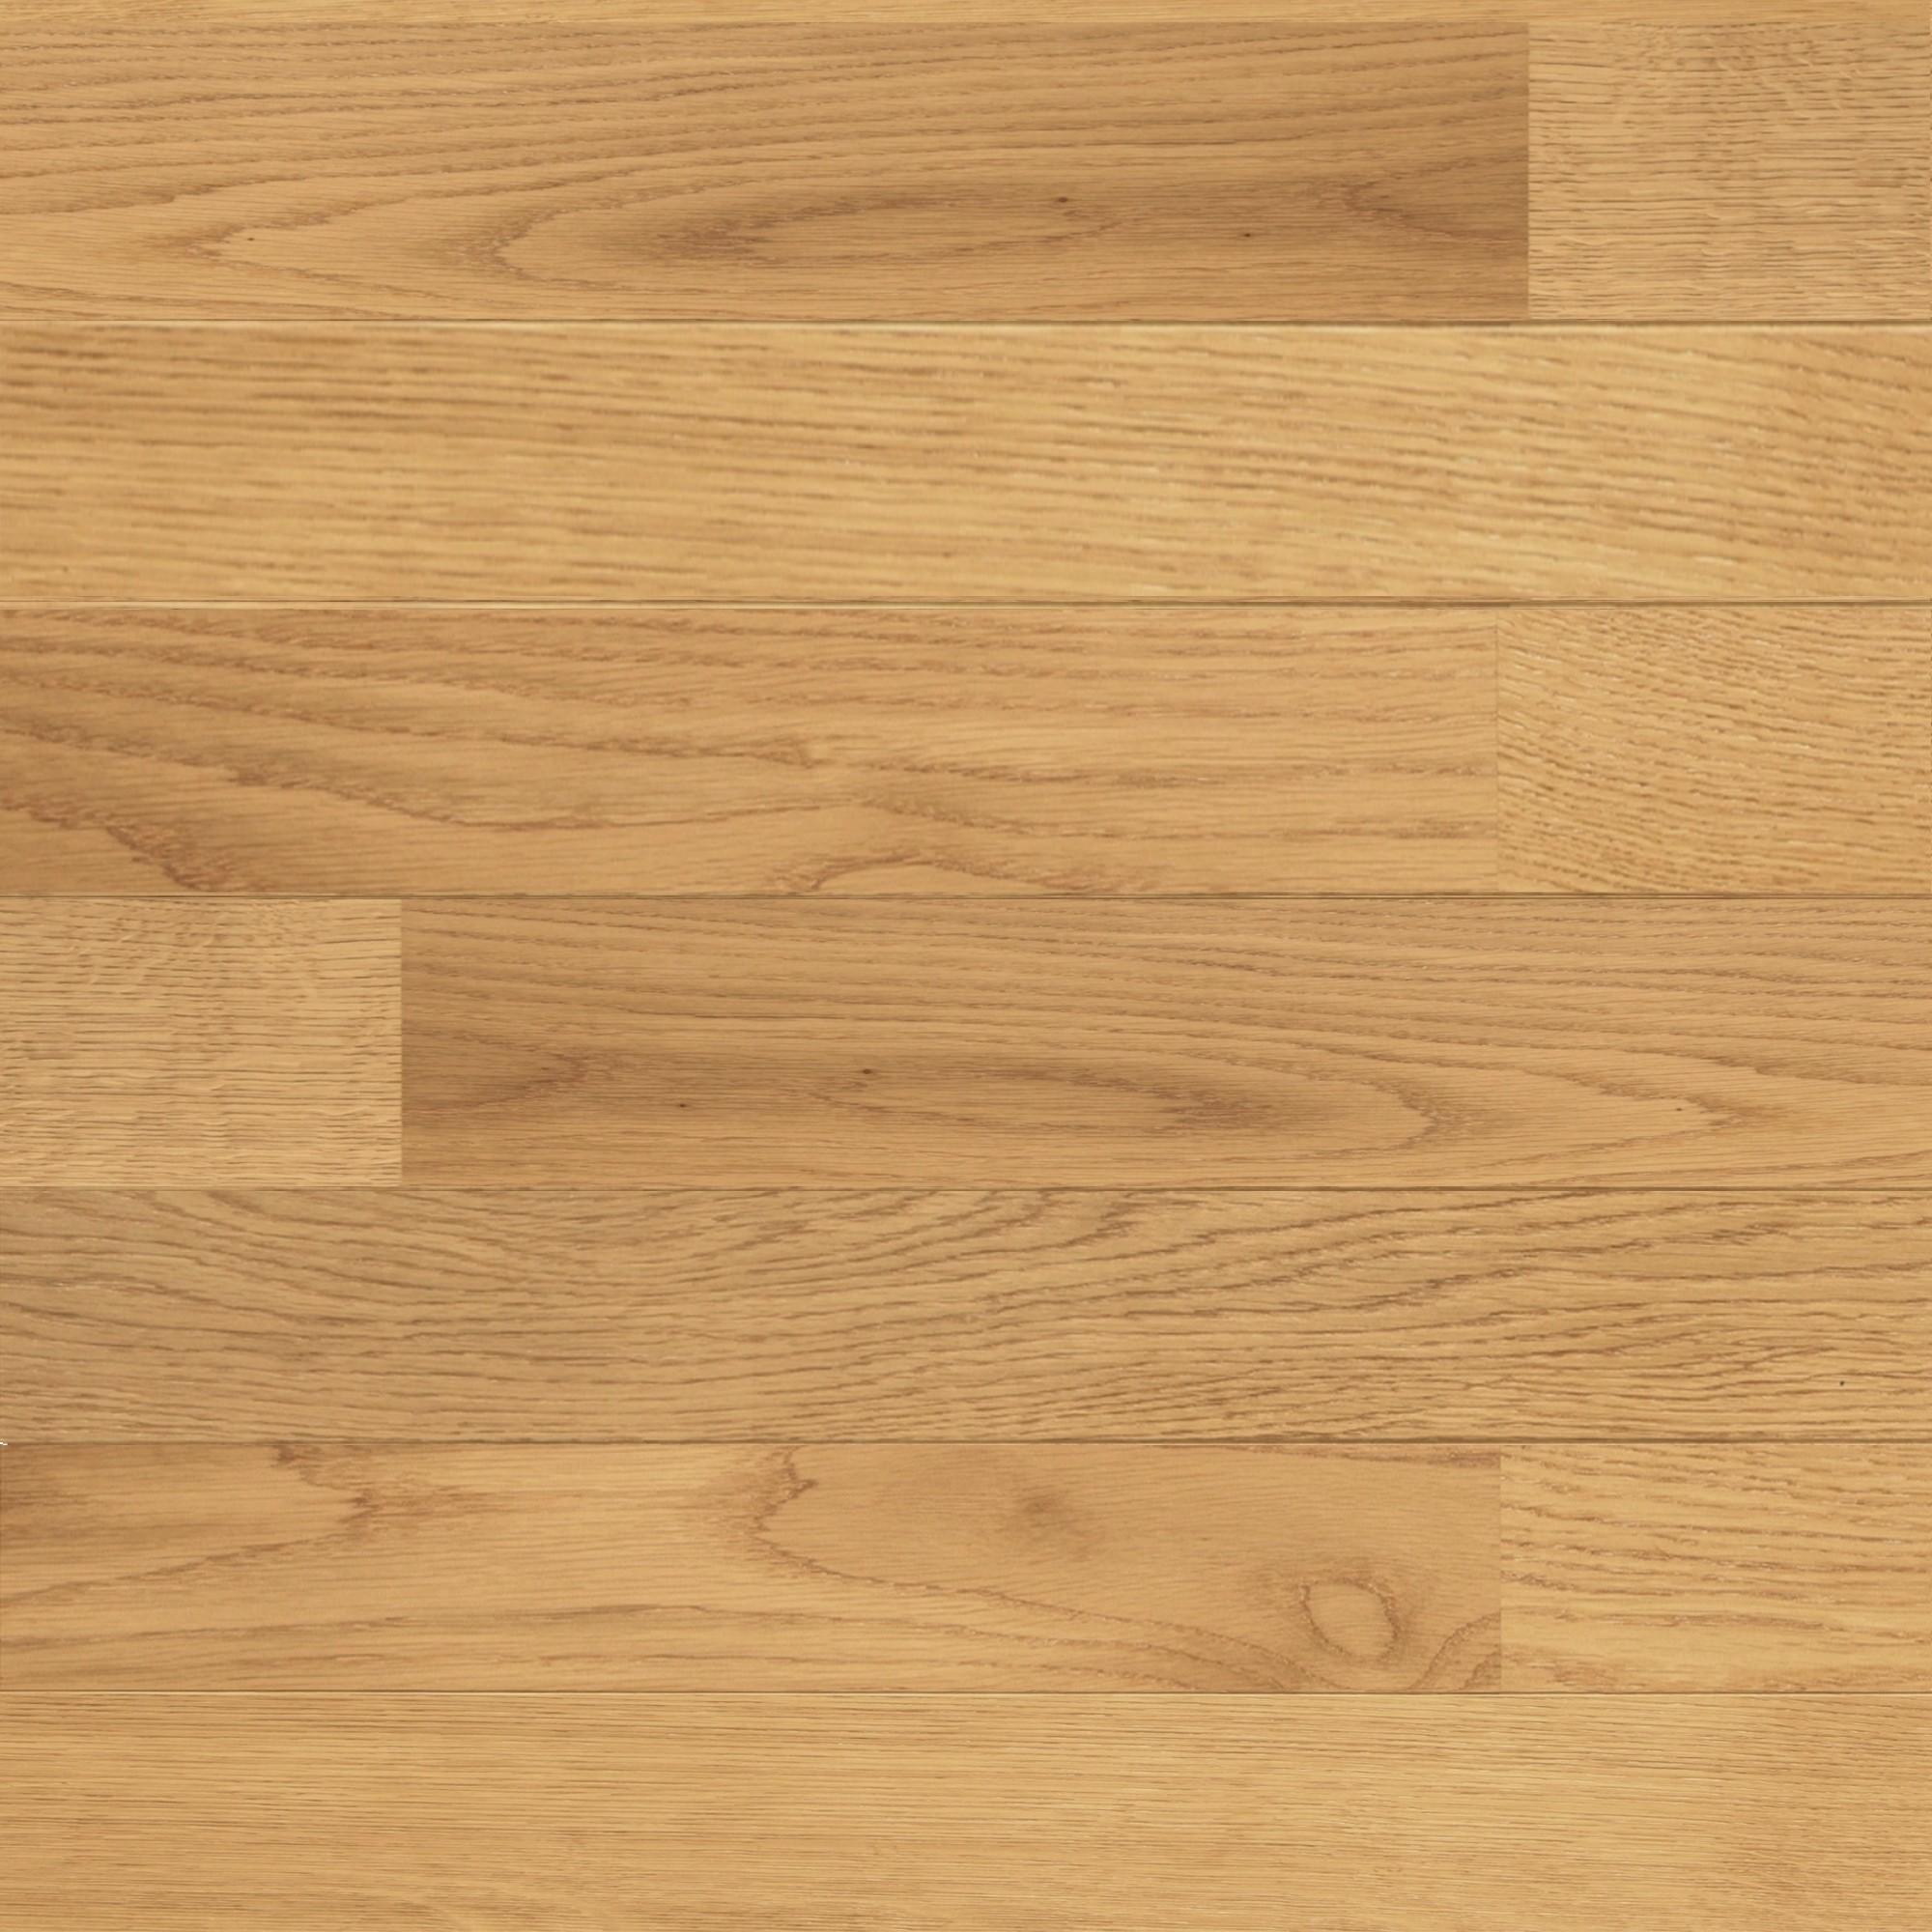 parquet ch ne massif partir de mobler home. Black Bedroom Furniture Sets. Home Design Ideas